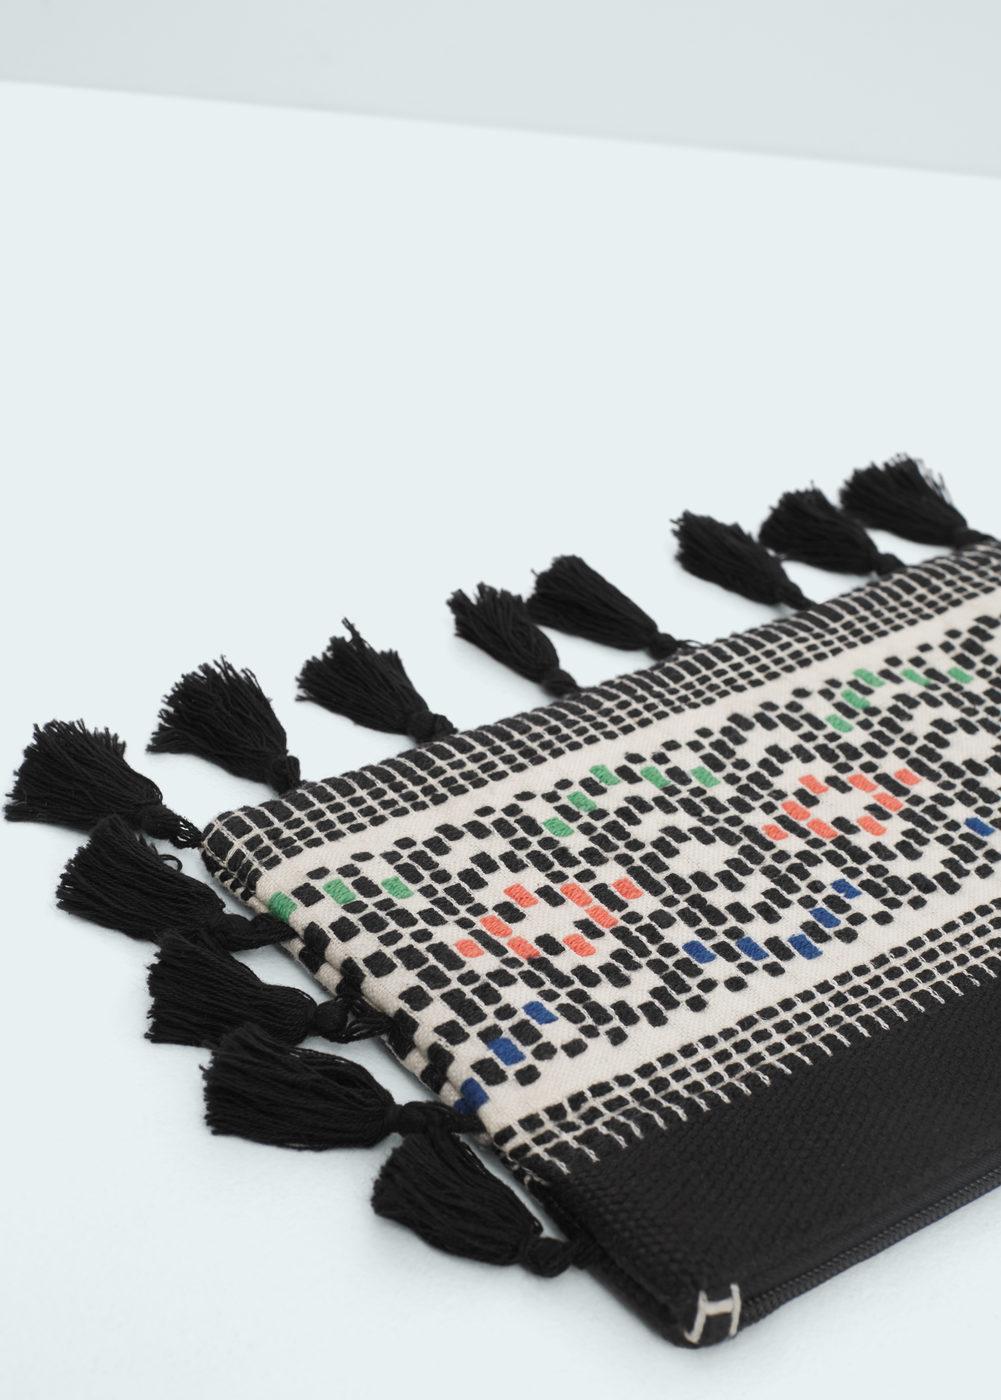 Mango Tassel Ethnic Cosmetic Bag, $39